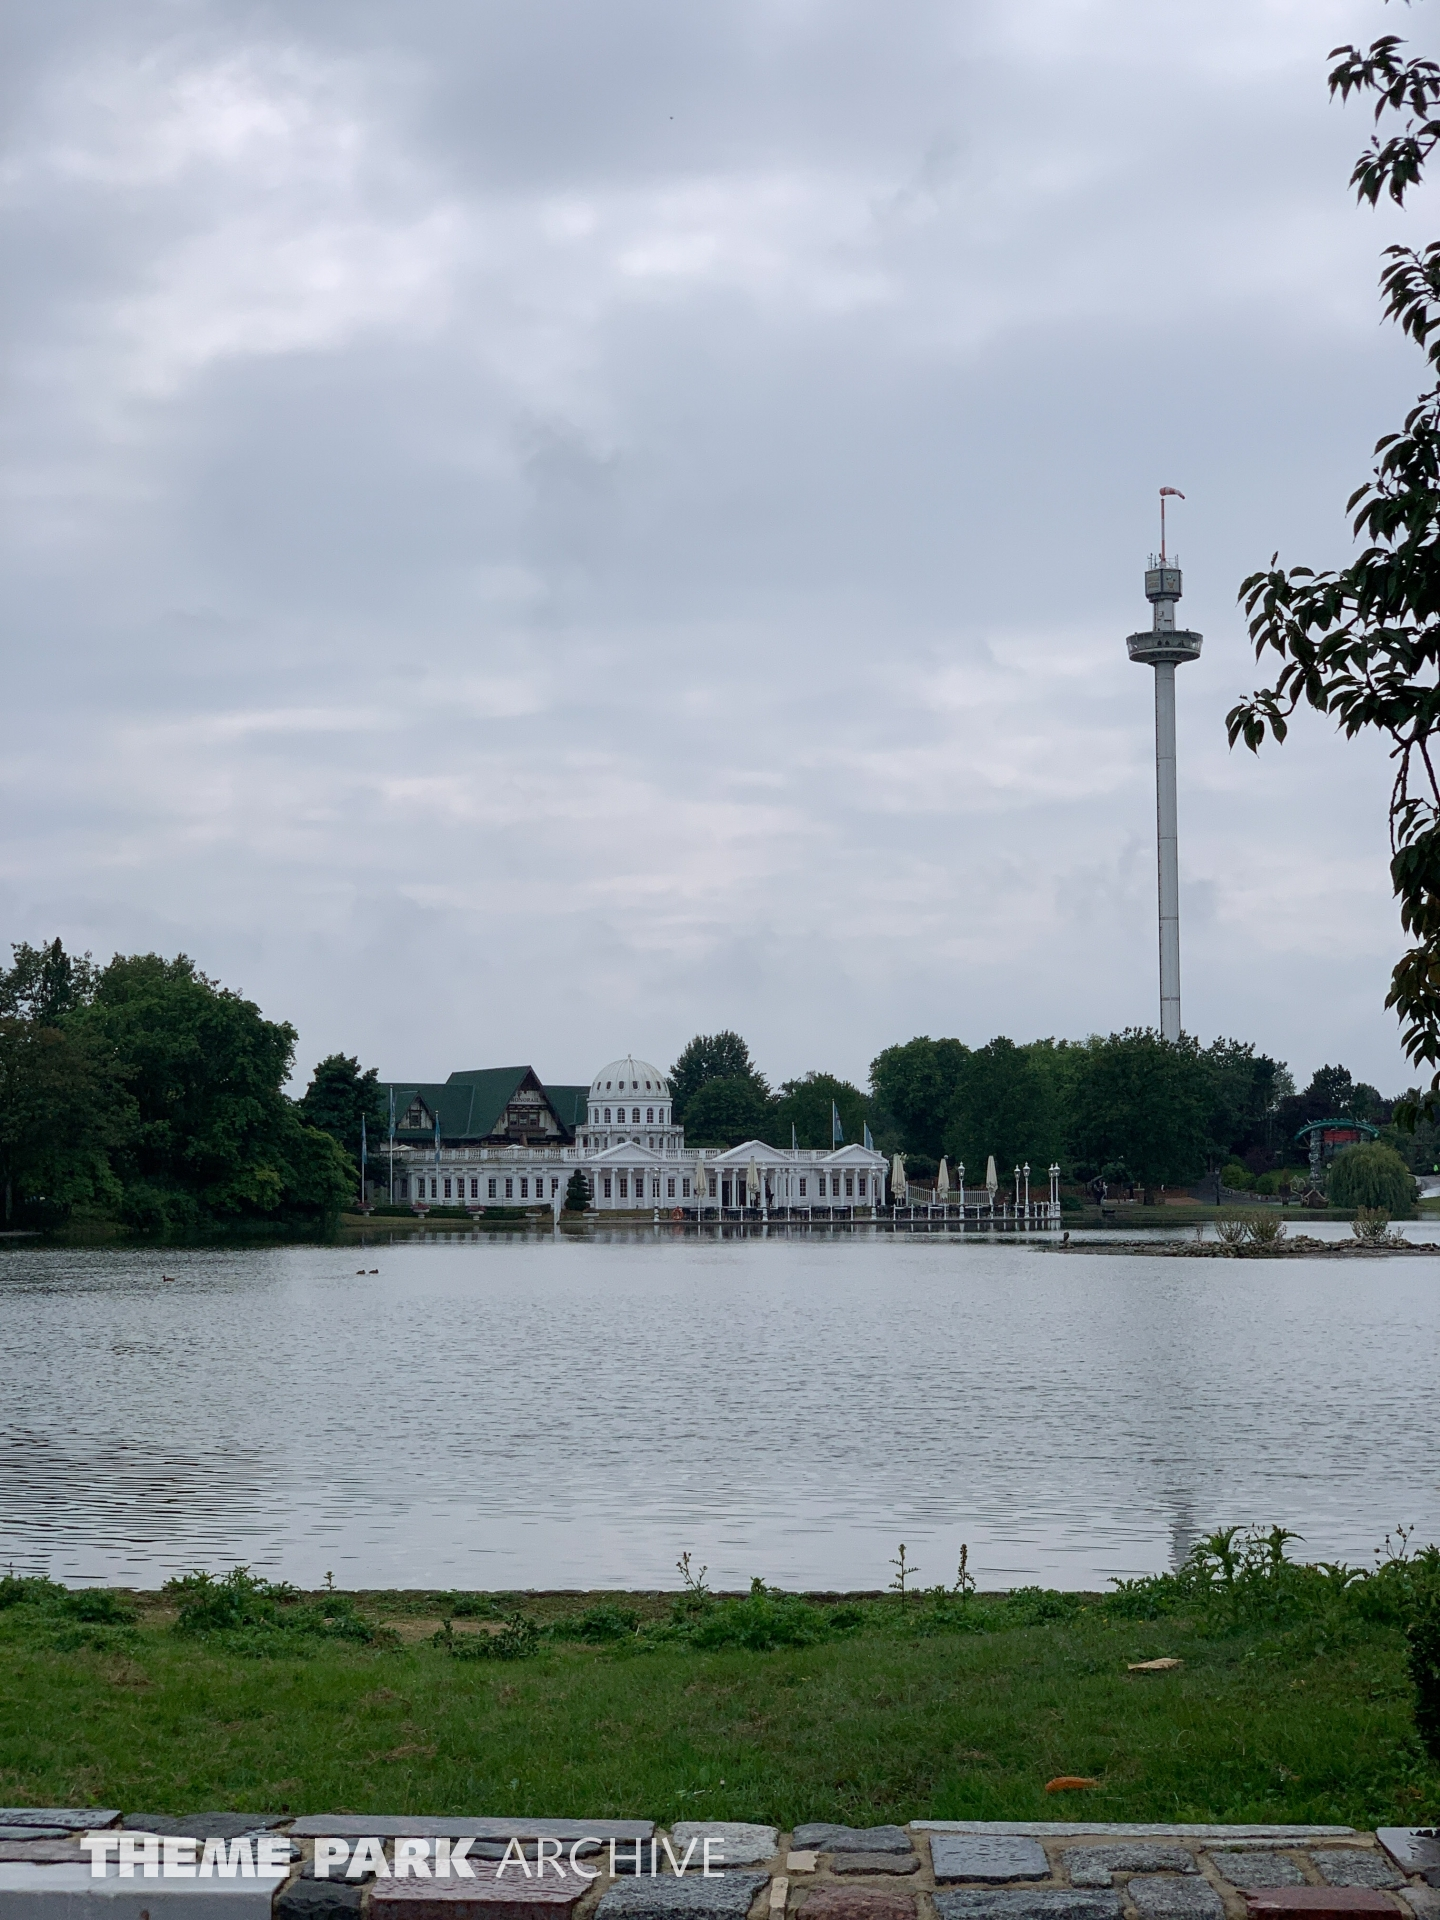 Panoramaturm at Heide Park